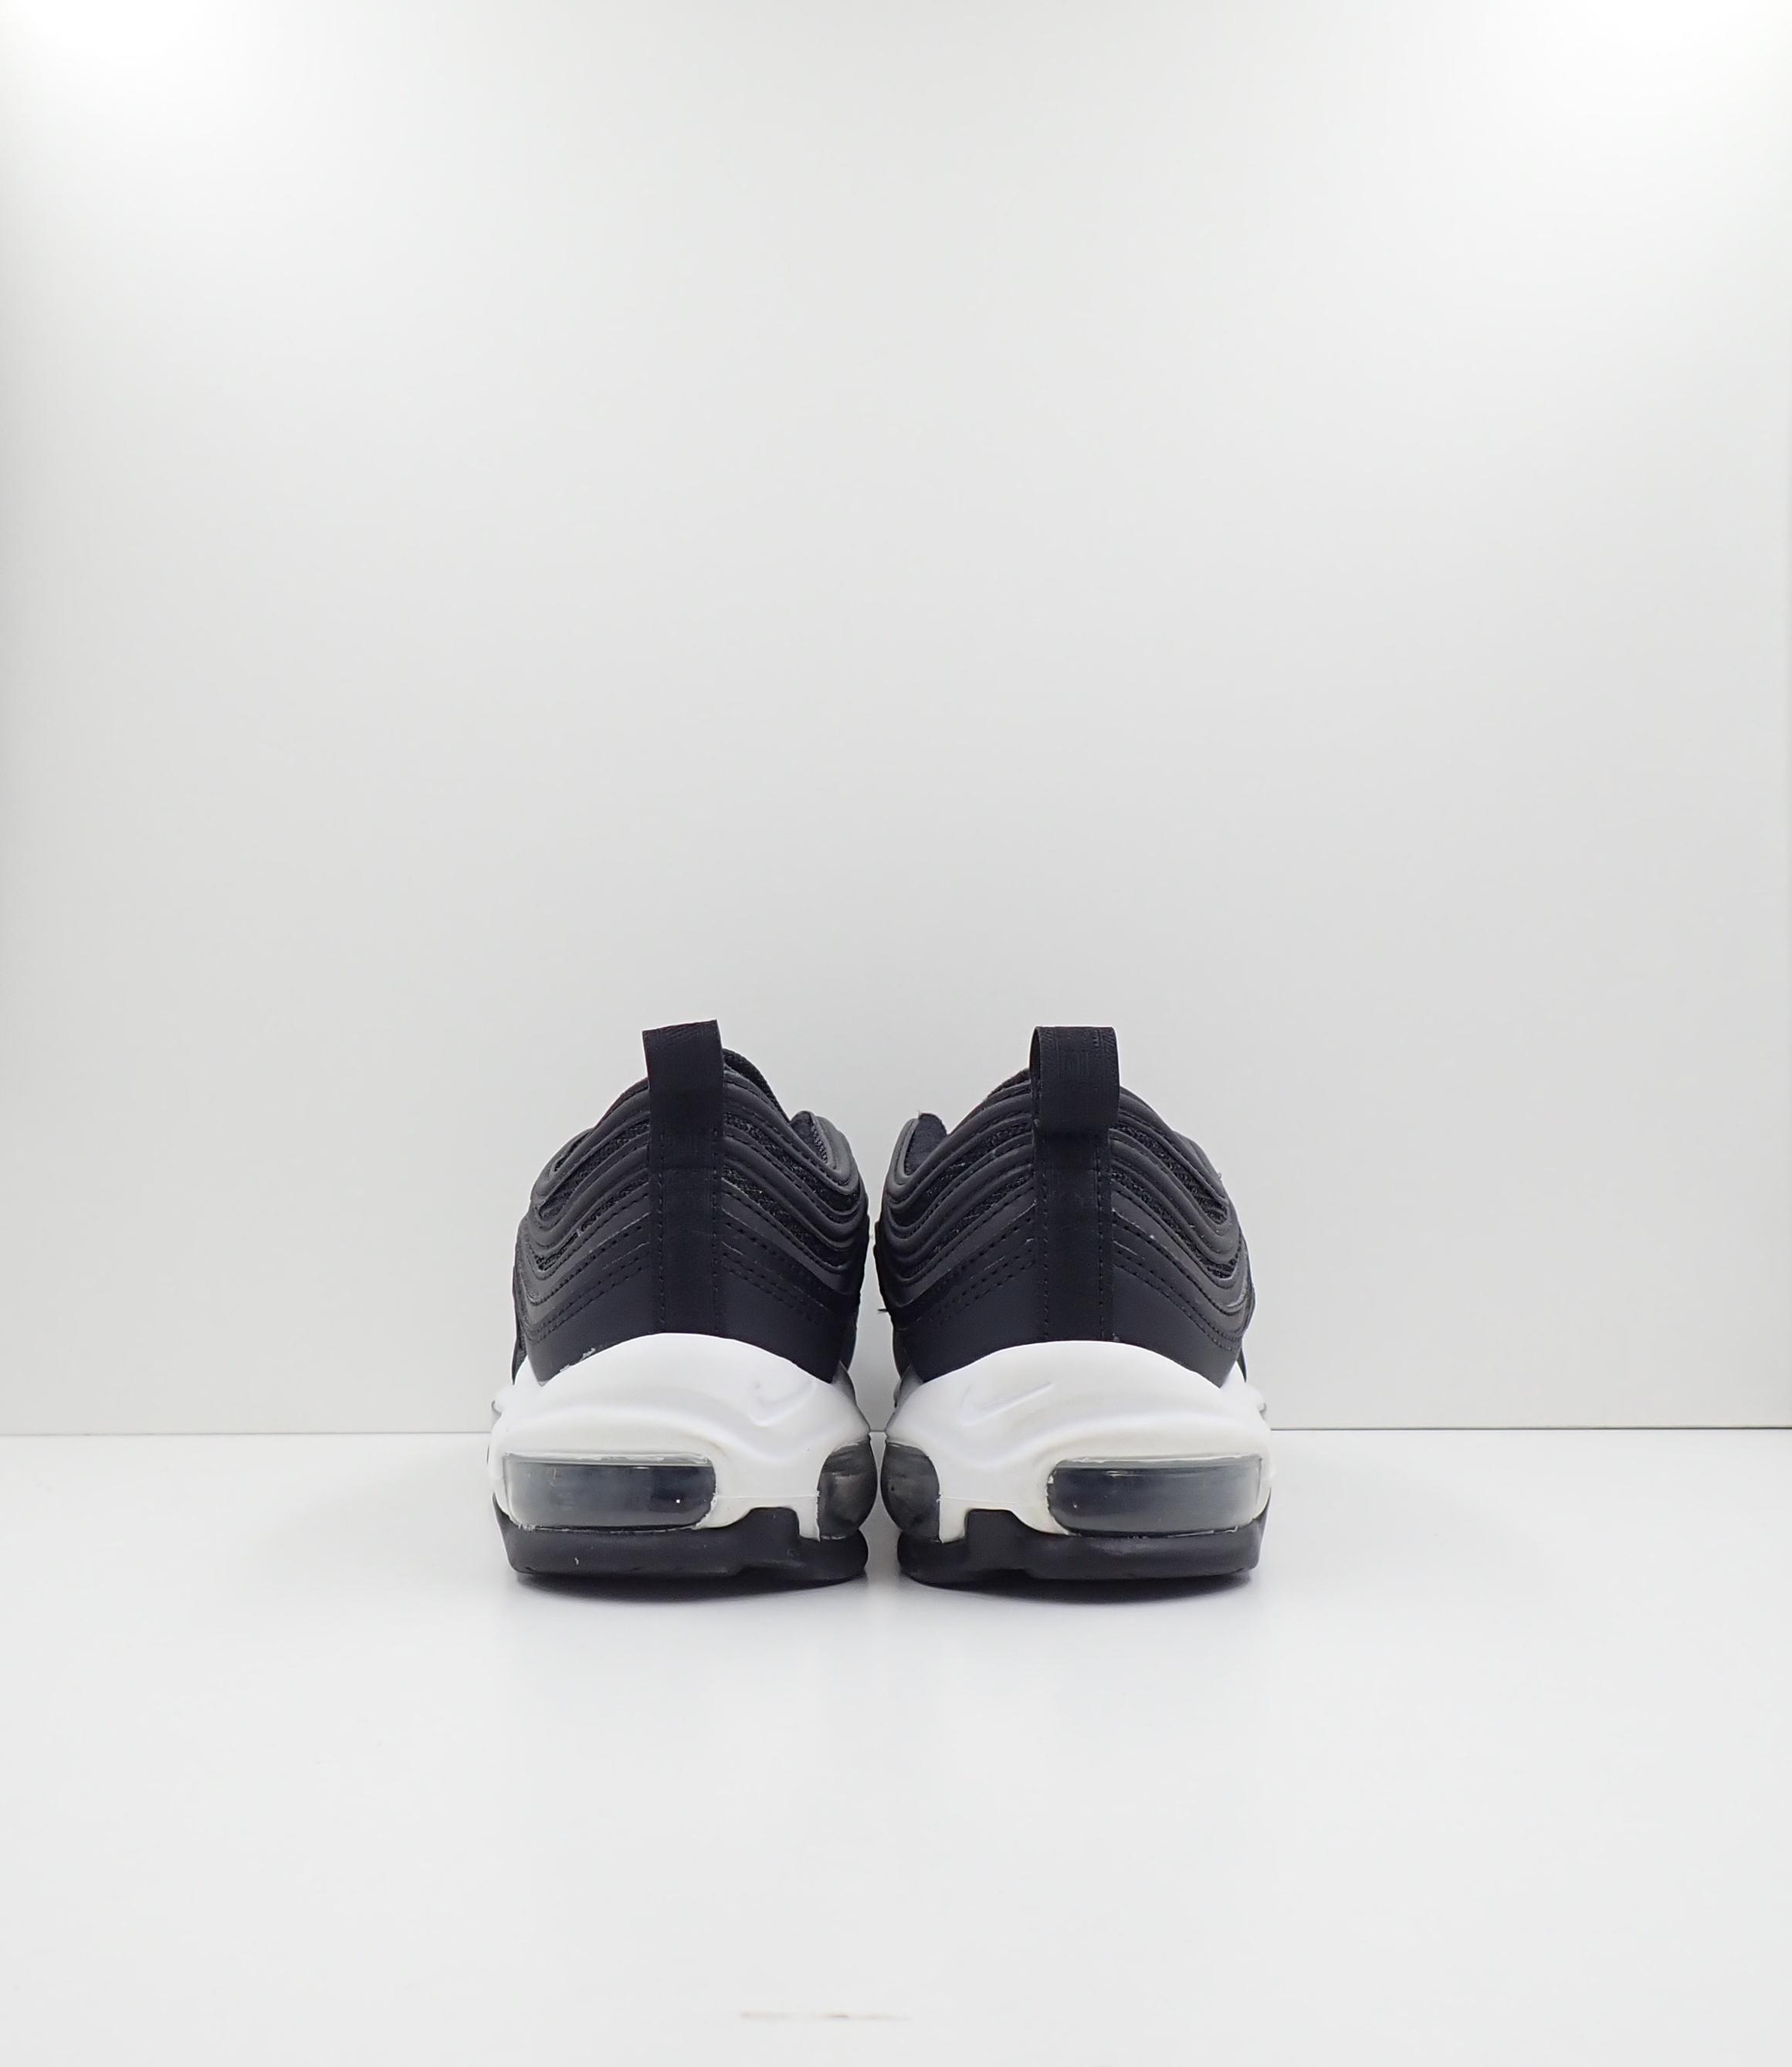 Nike Air Max 97 Black Black White (W)